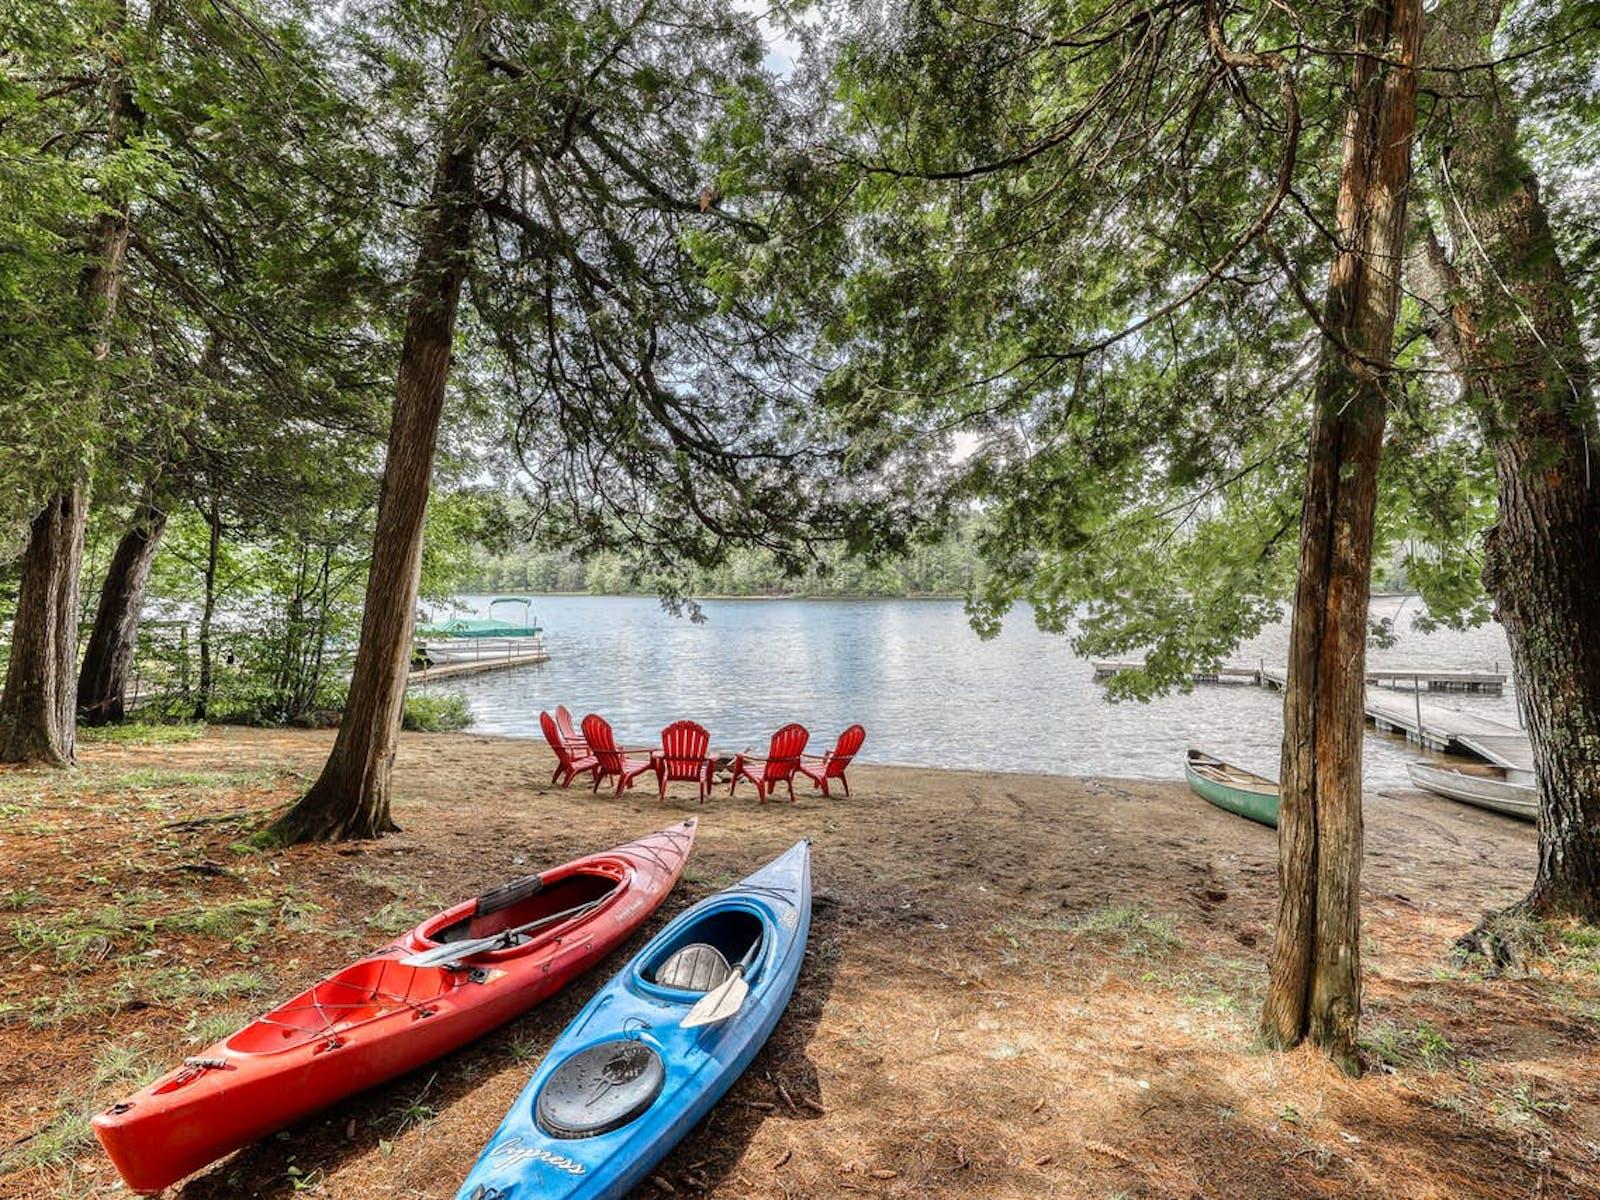 Two kayaks sit near waters edge in The Adirondacks